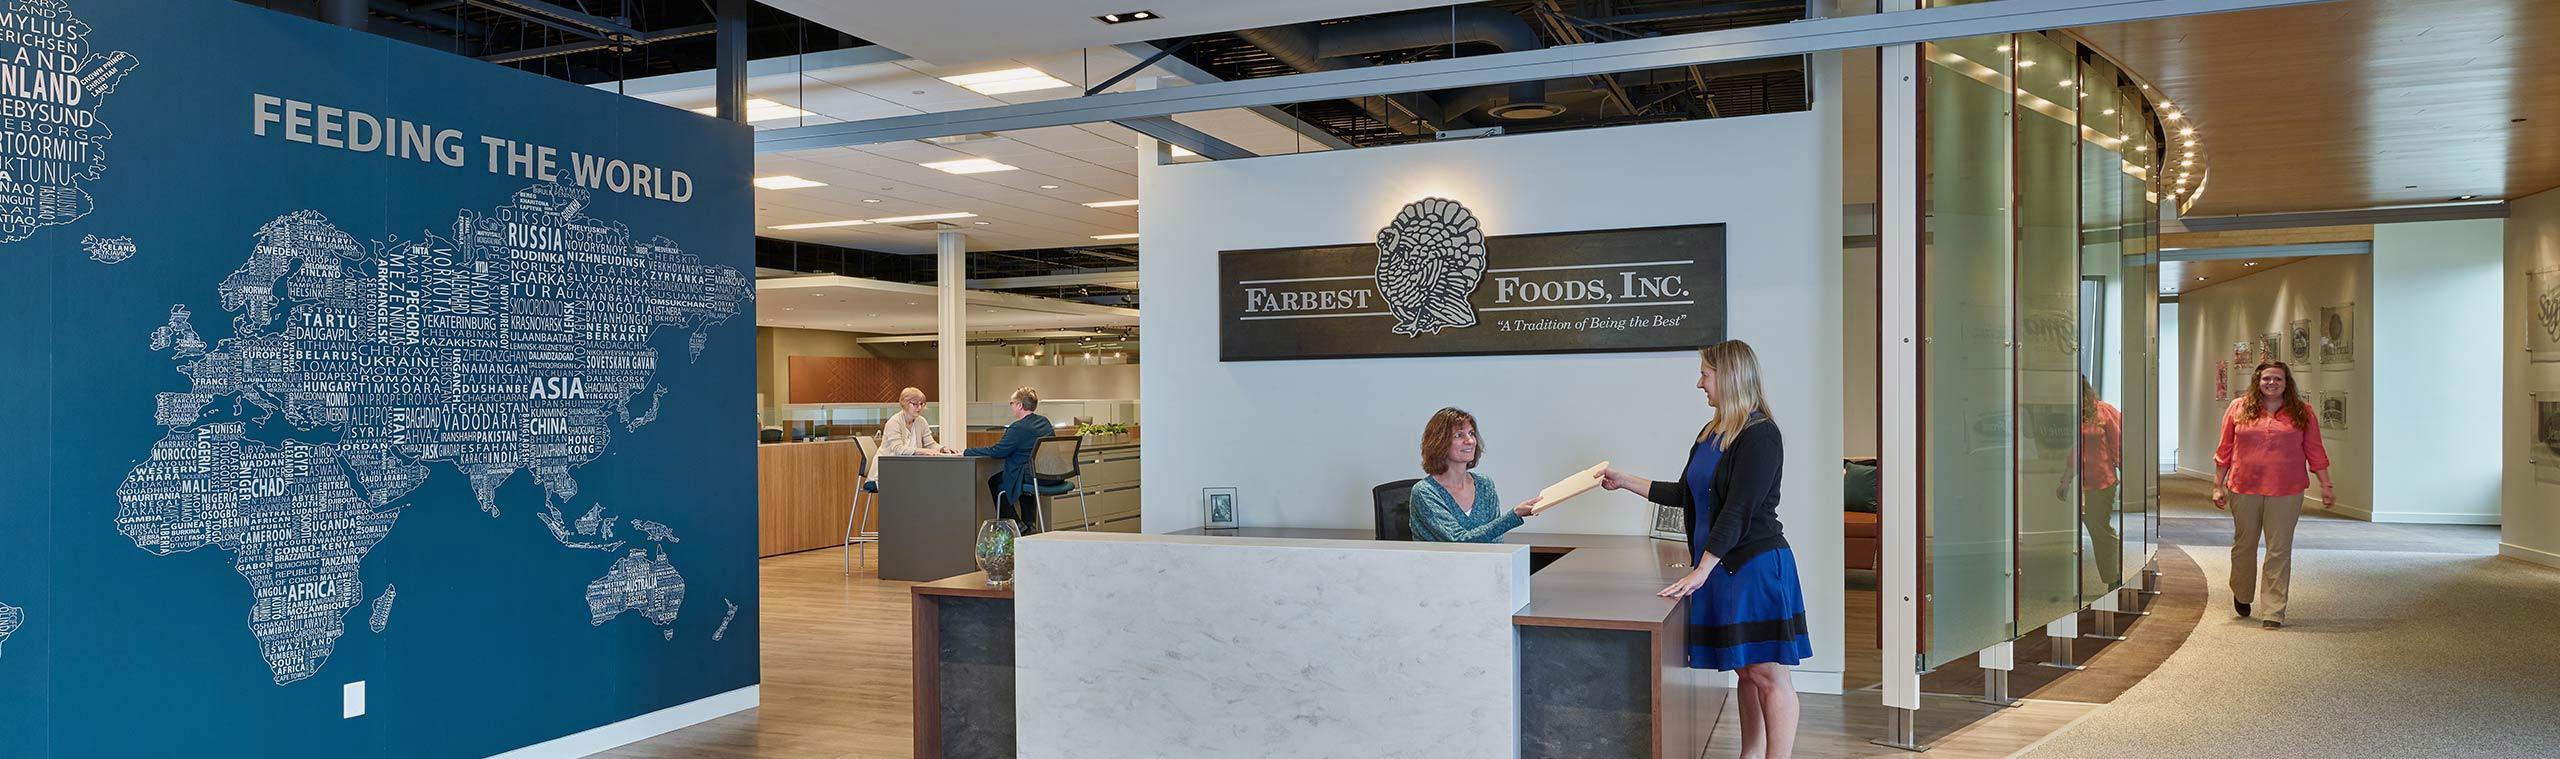 Farbest Corporate Headquarters Lobby